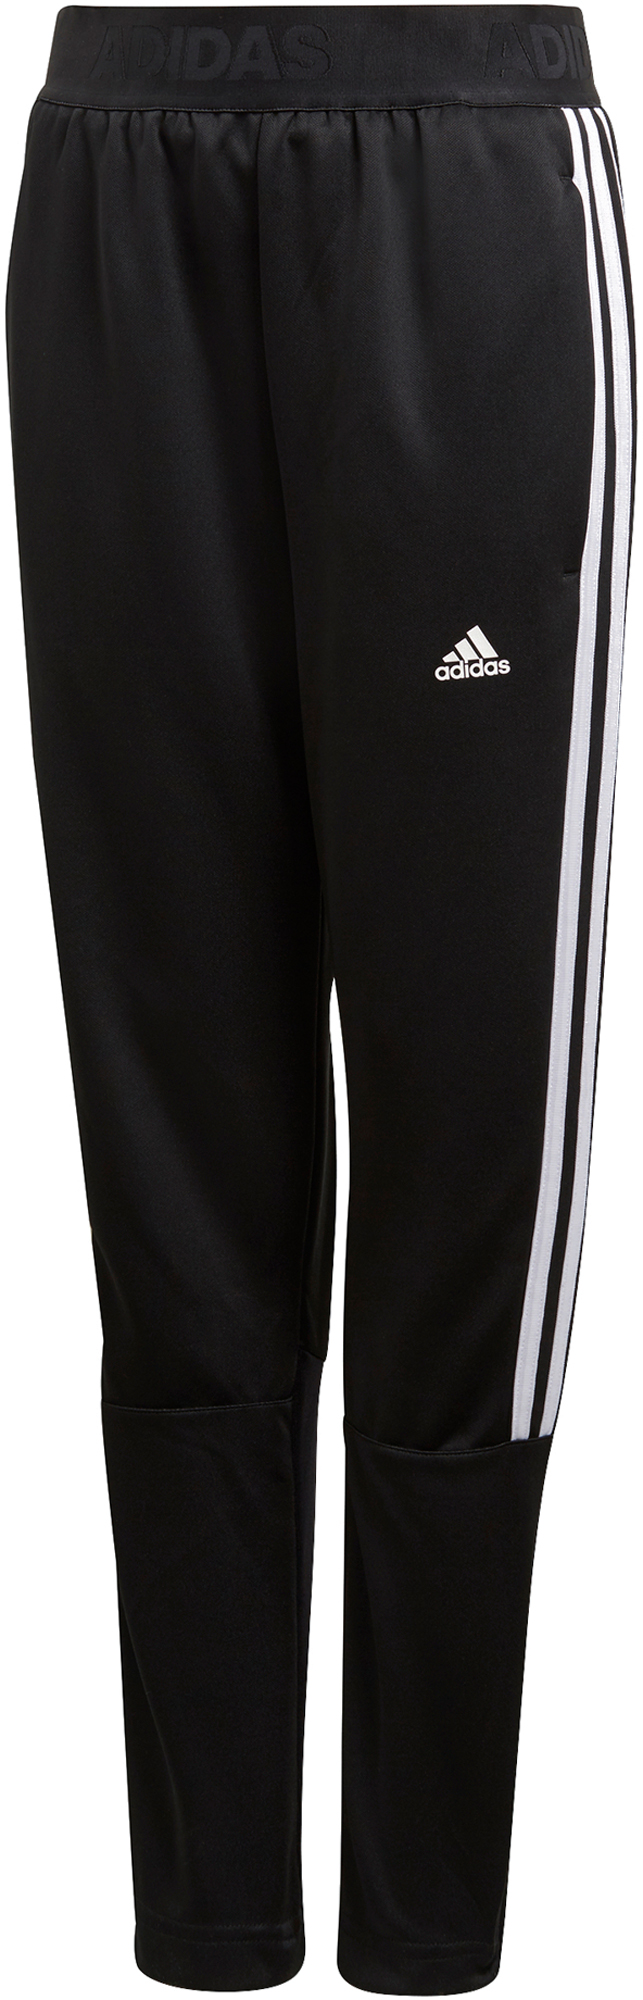 Adidas Брюки для мальчиков adidas Tiro, размер 152 шапка adidas tiro cap s13319